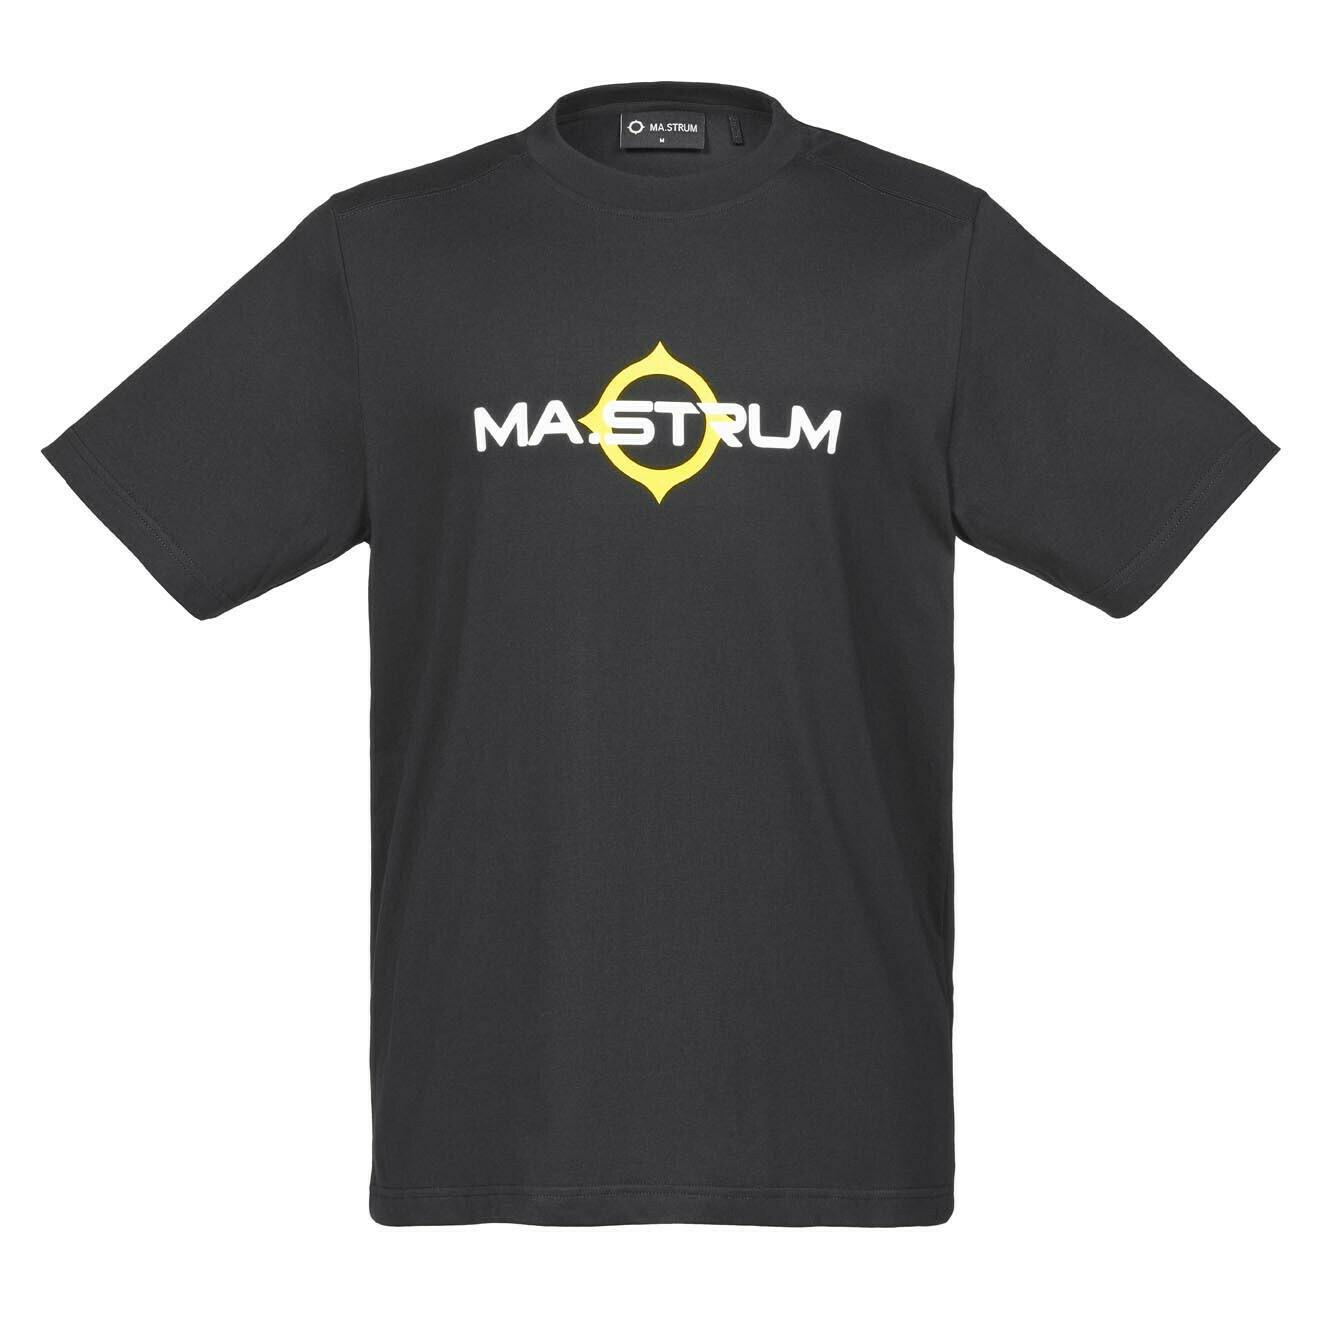 Mastrum | SS LOGO PRINT TEE | Jet Black